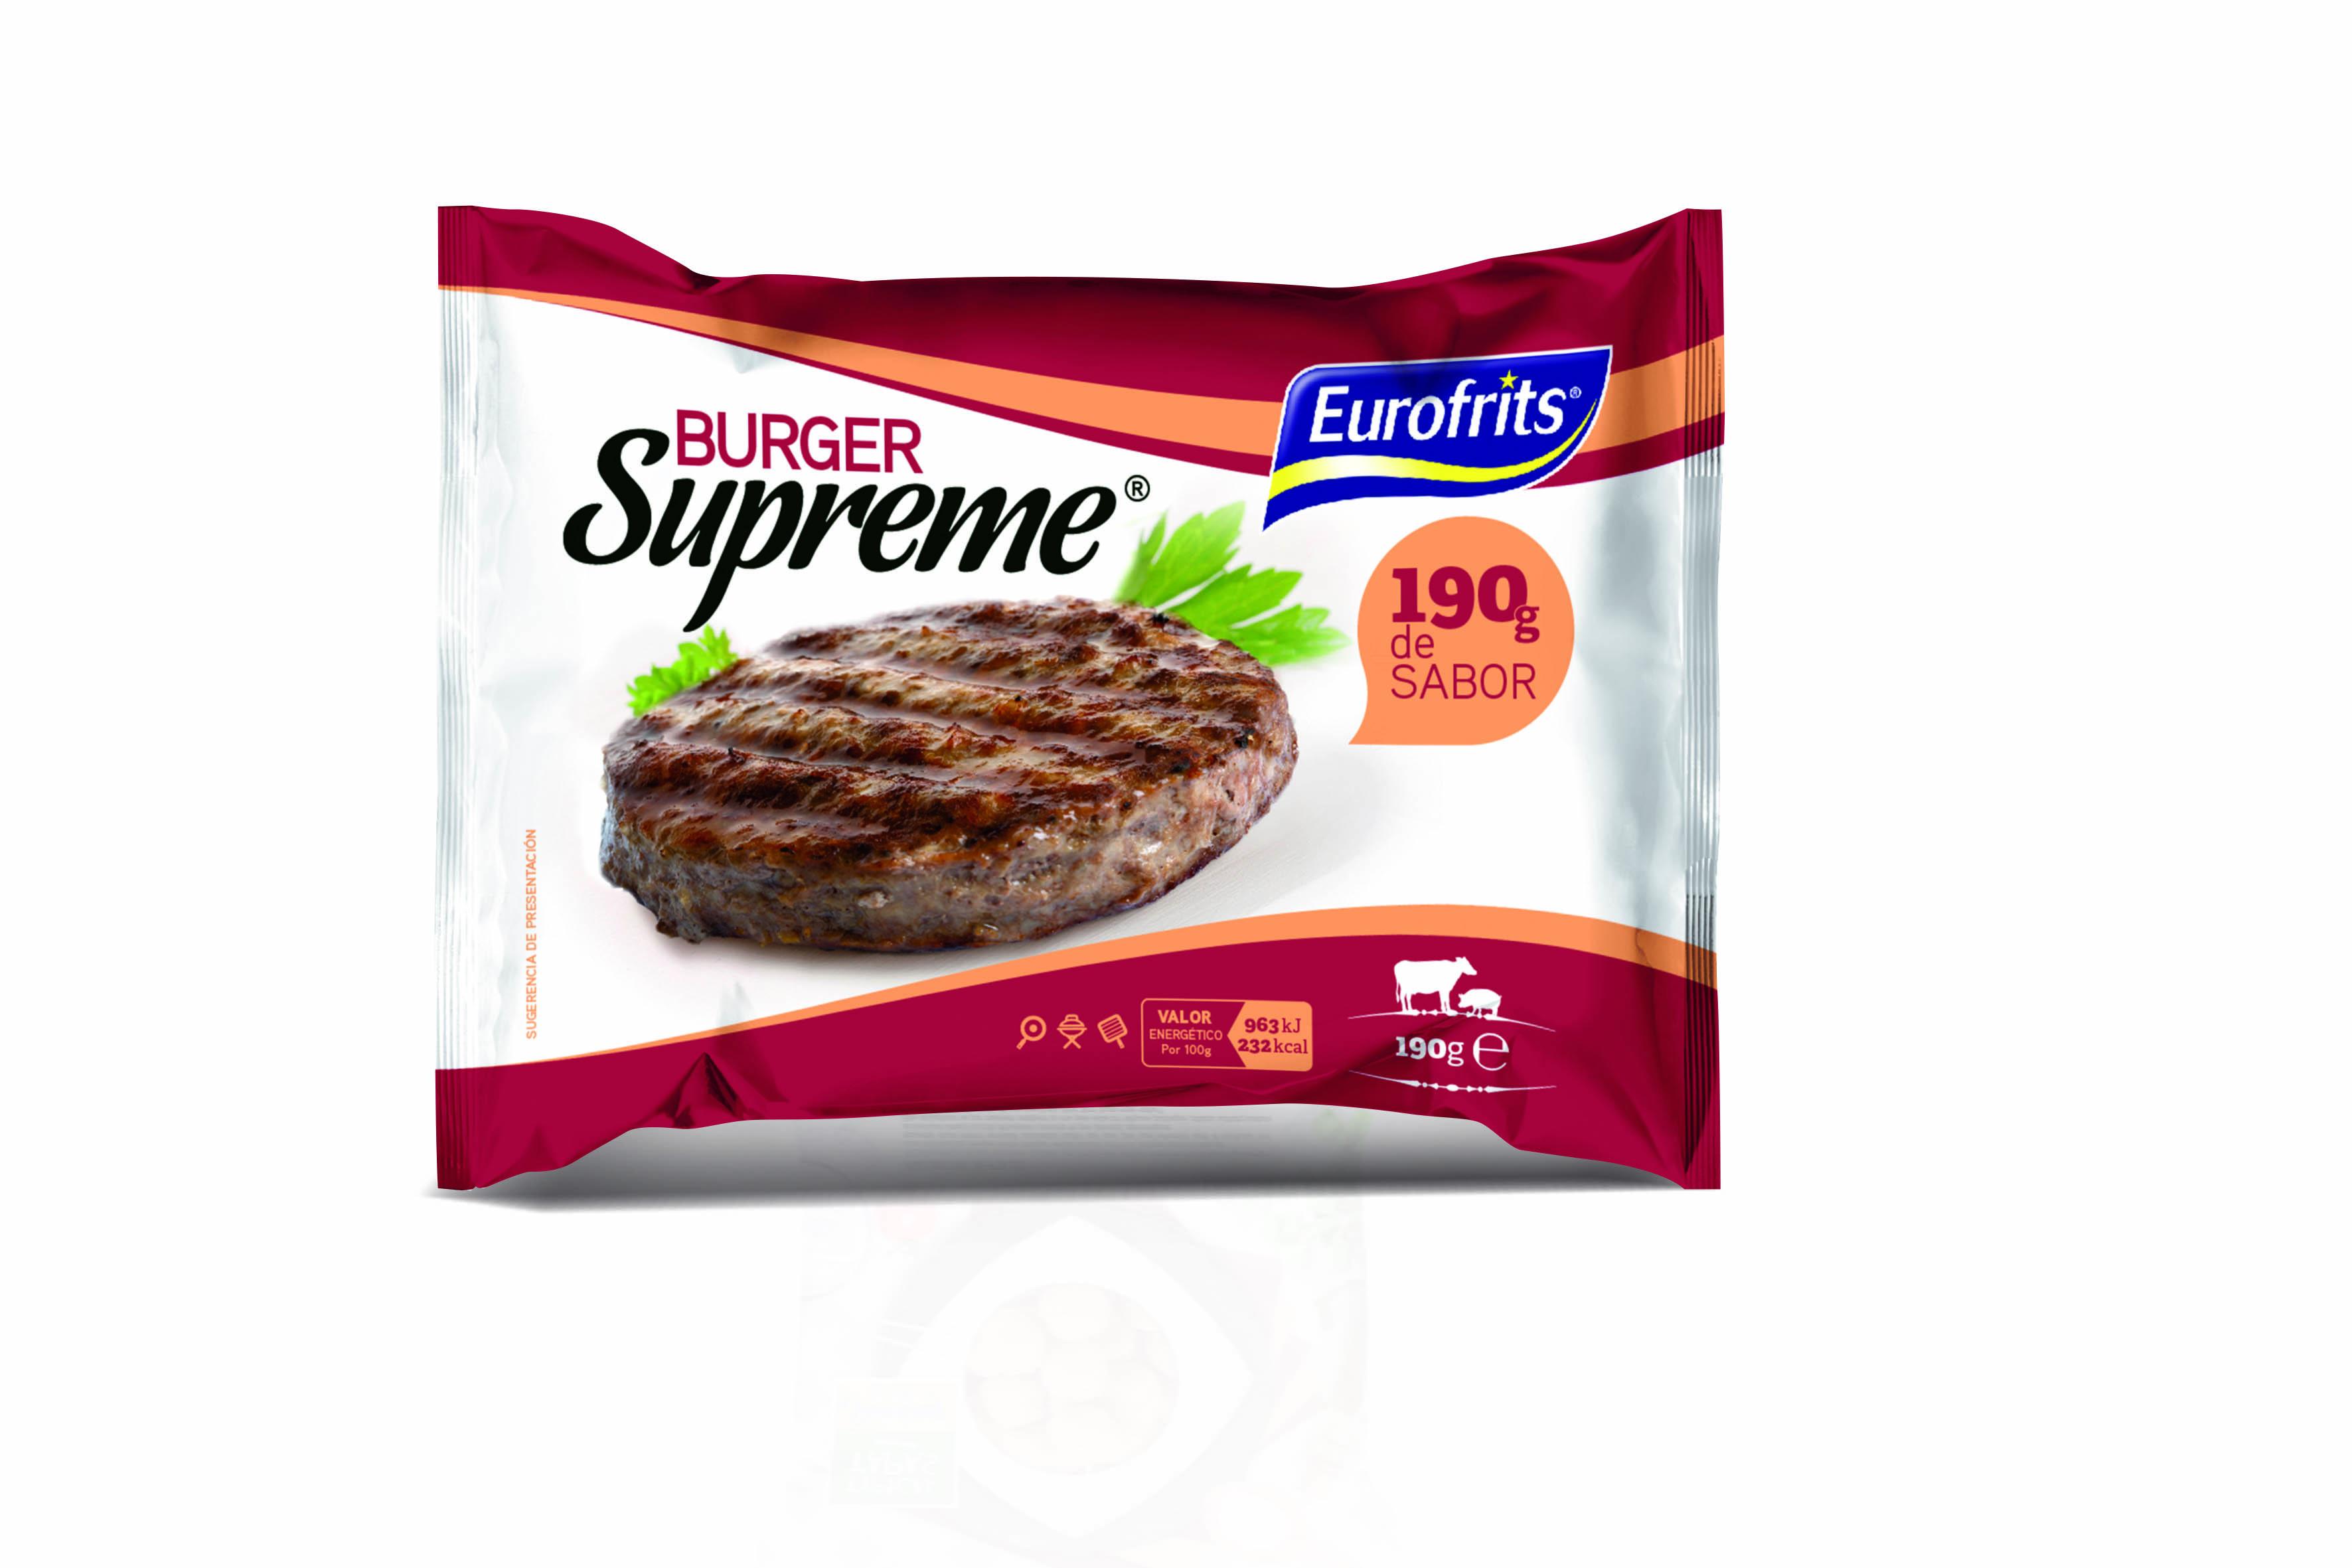 Burger Supreme Eurofrits